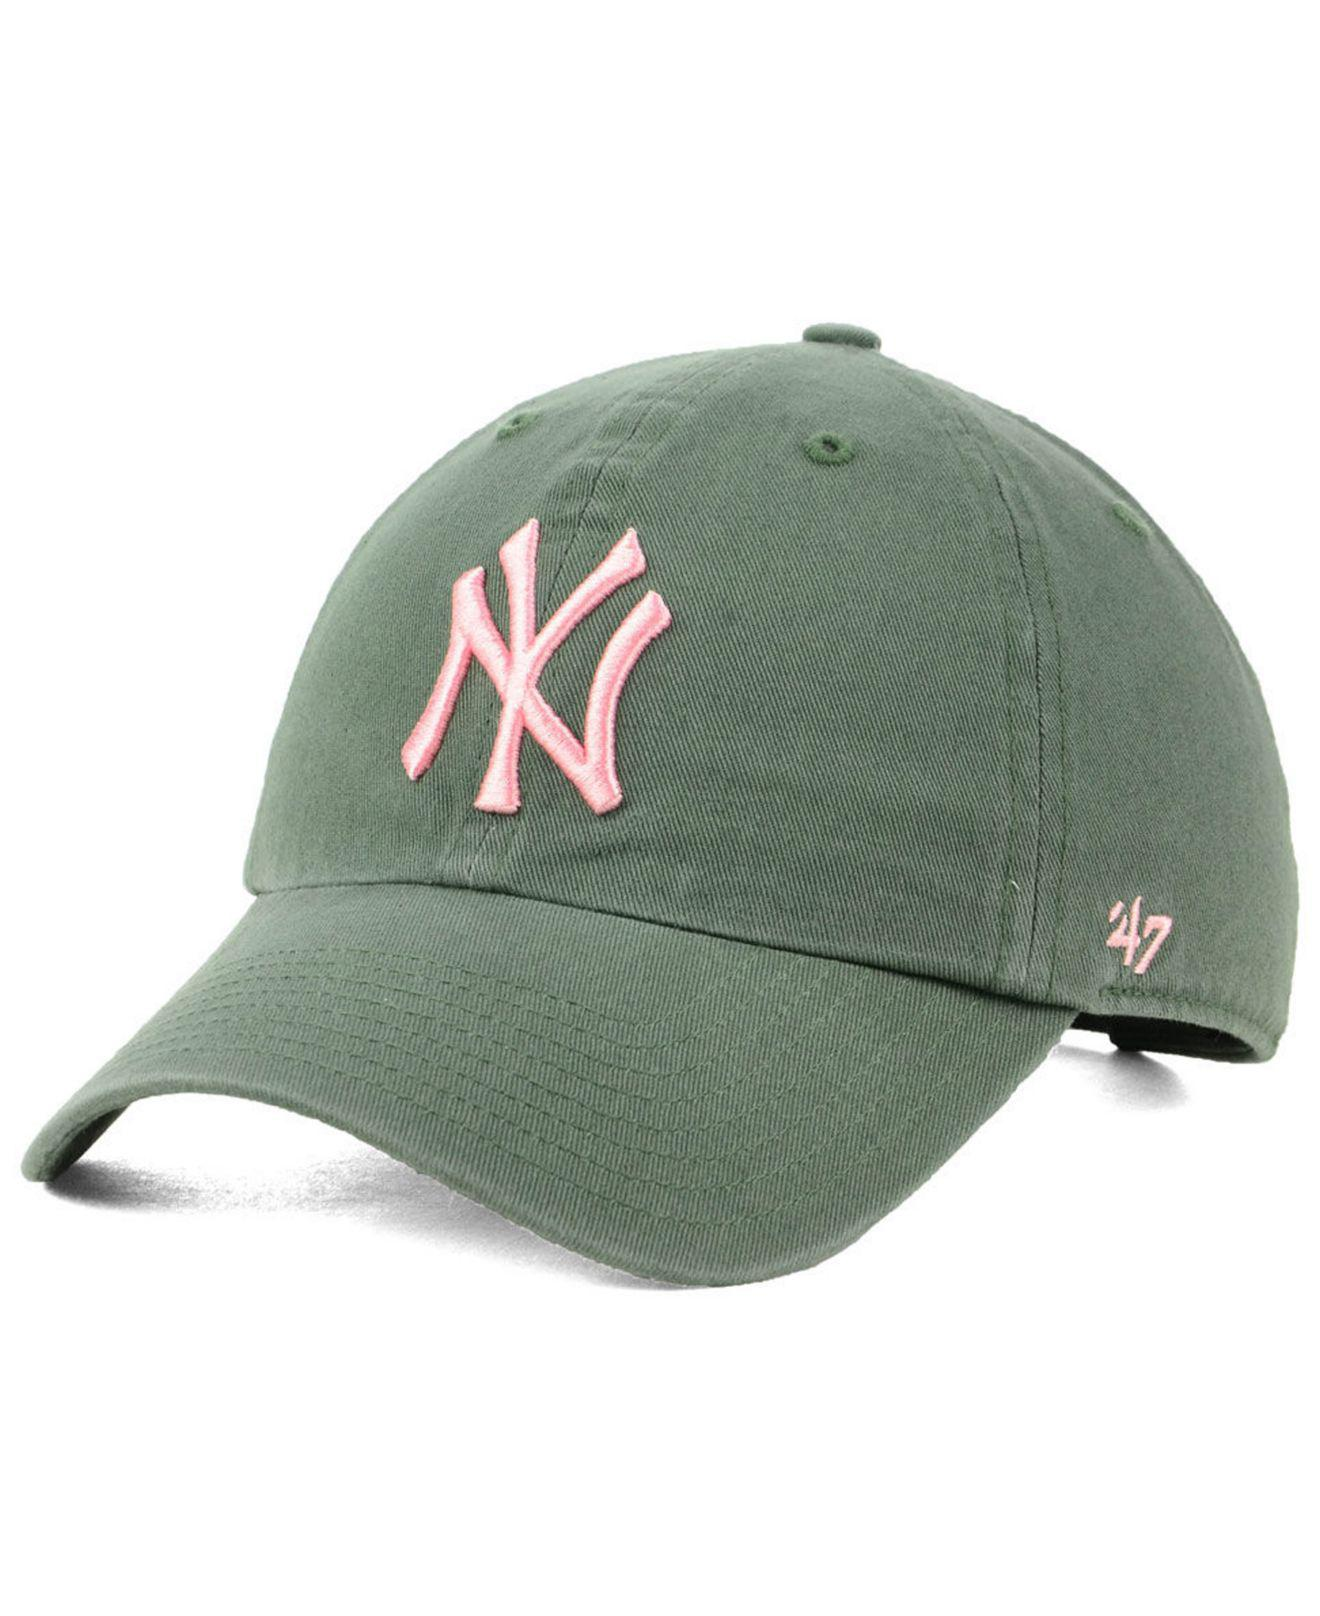 ae0b90f5535 50% off 47 brand. womens green new york yankees moss pink clean up cap